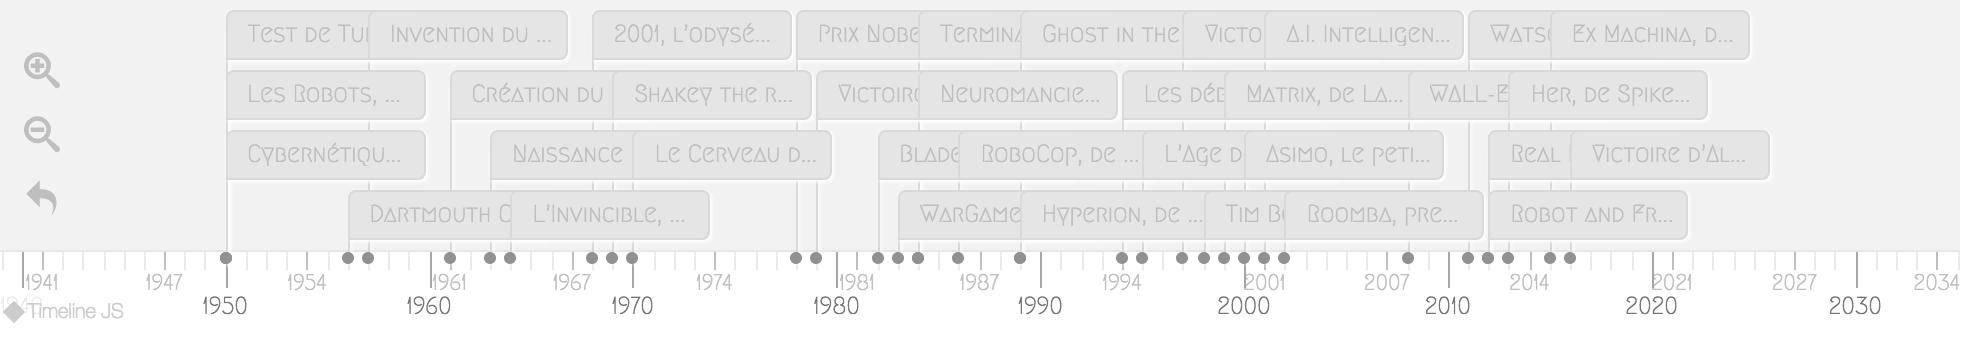 Chronologie robotique & IA